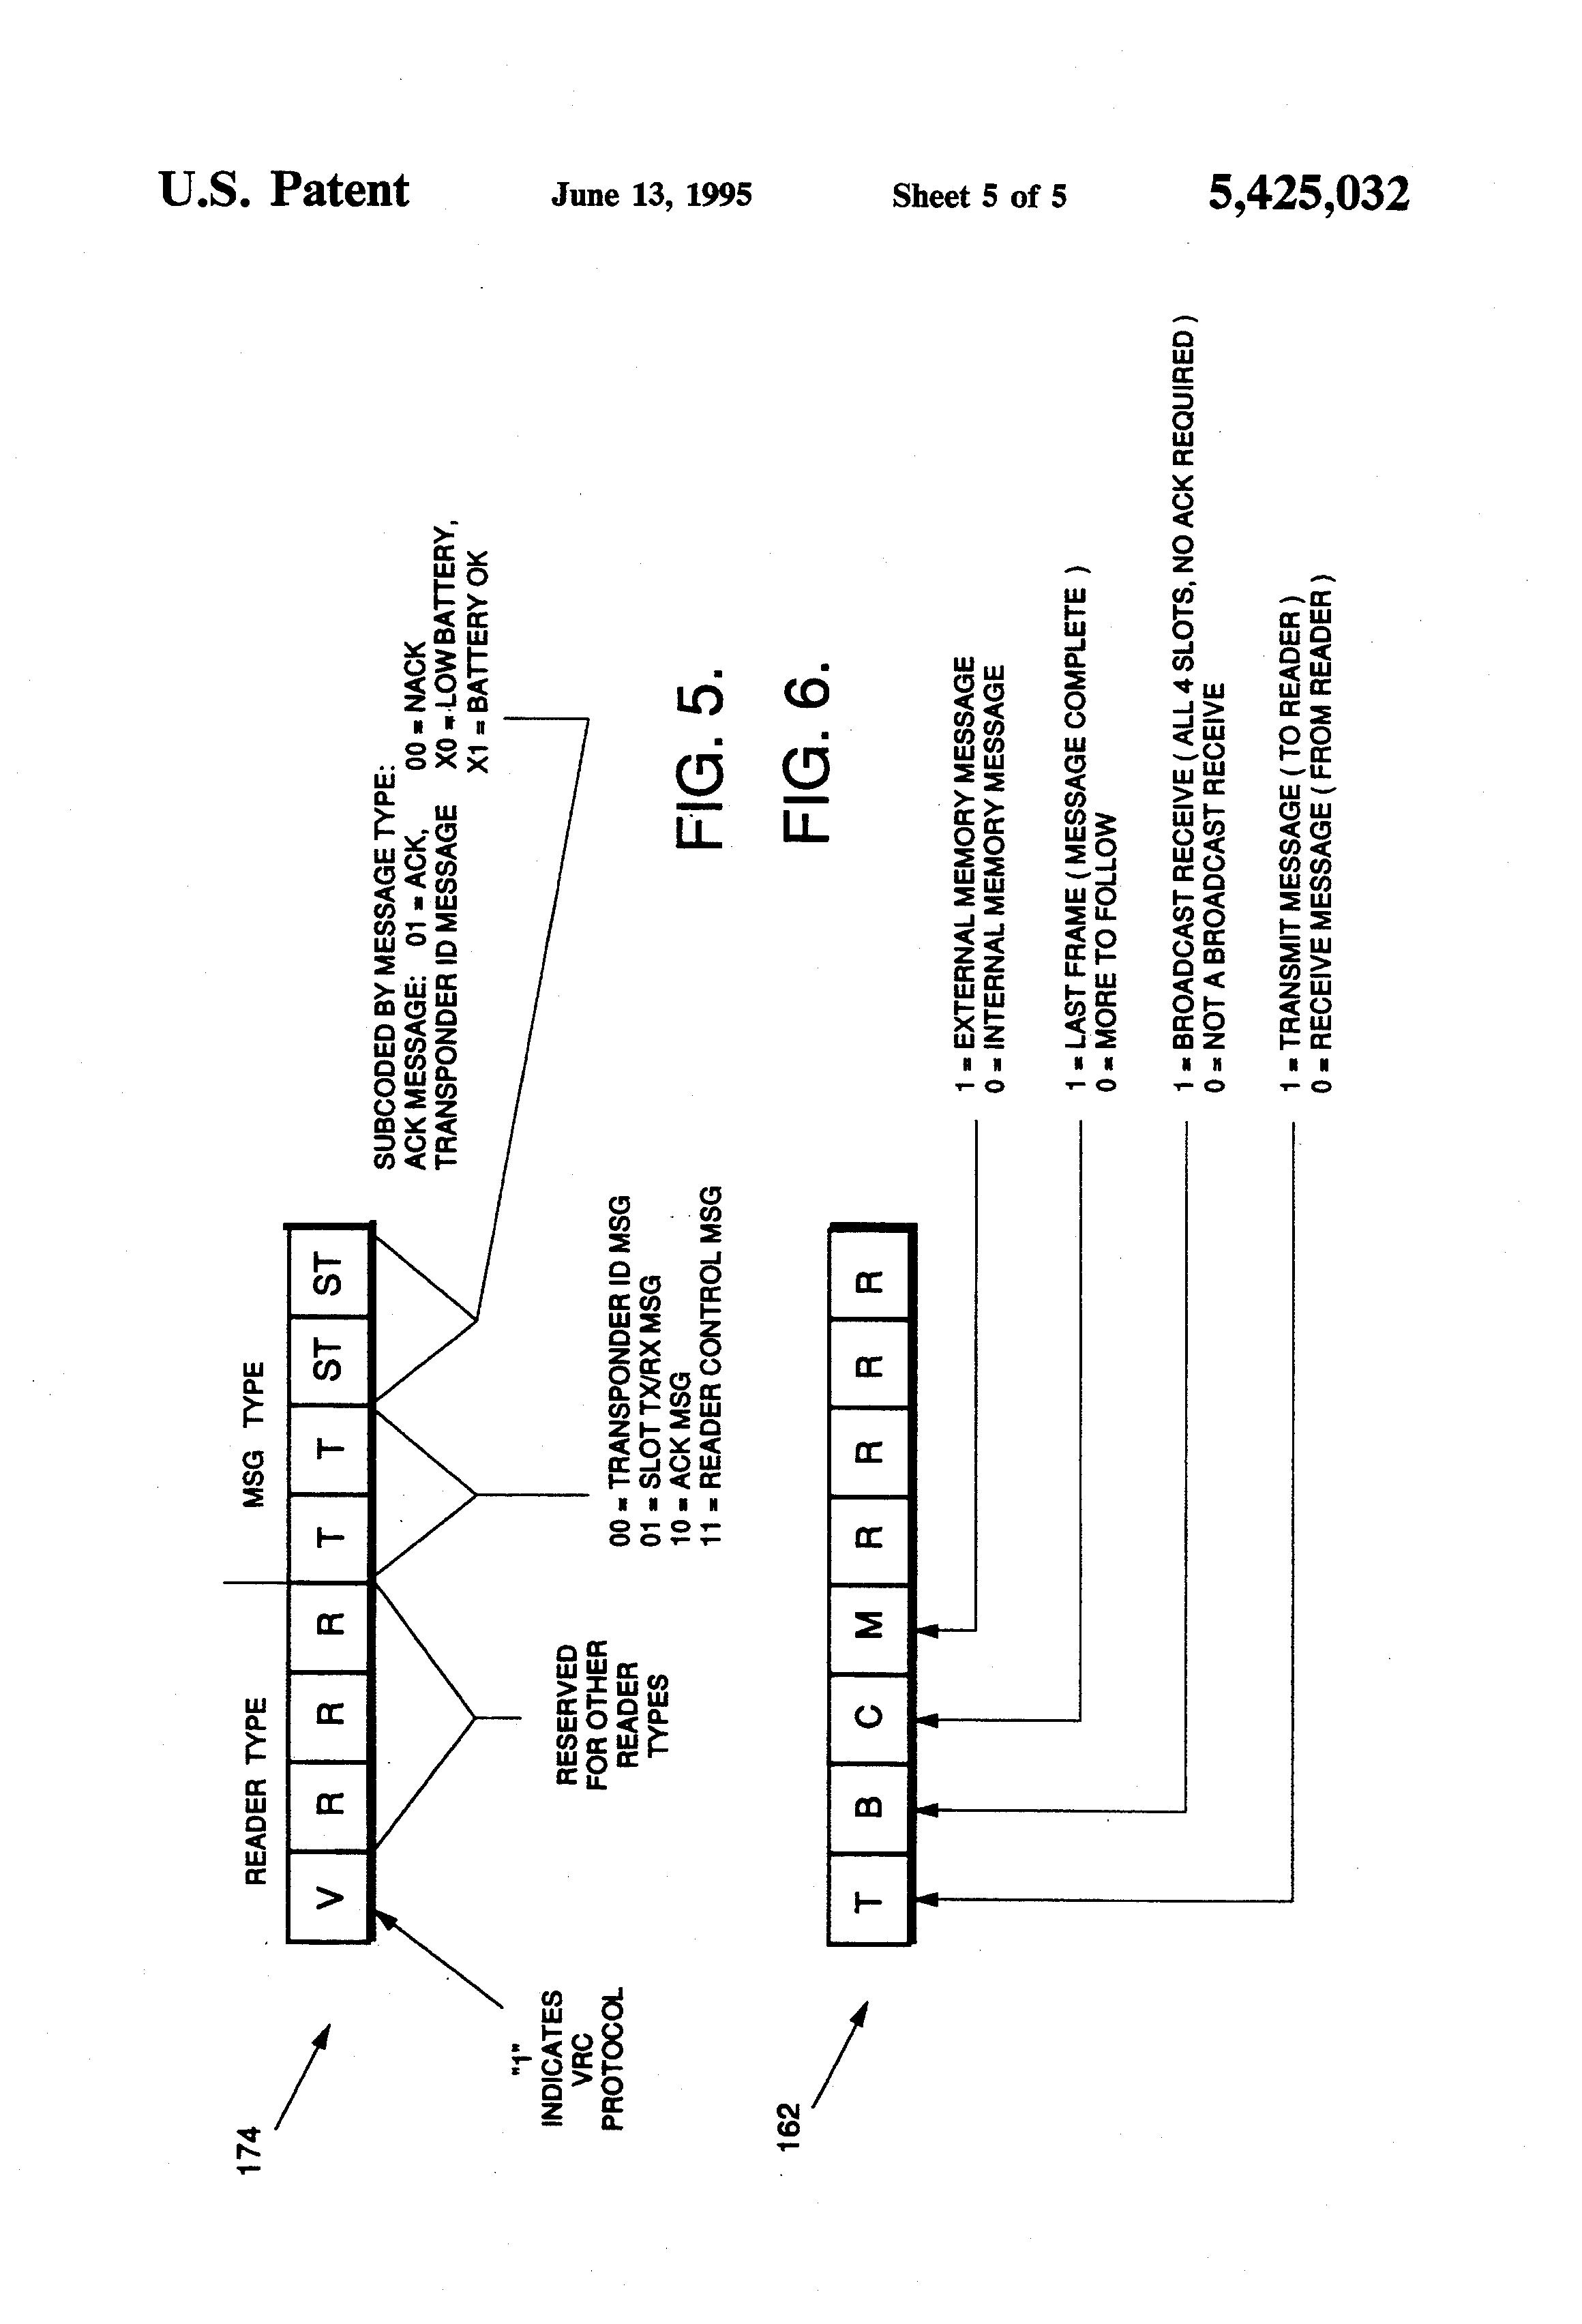 Astounding Fet Cascode Video Amplifier Circuit Diagram Tradeoficcom Basic Wiring 101 Akebretraxxcnl